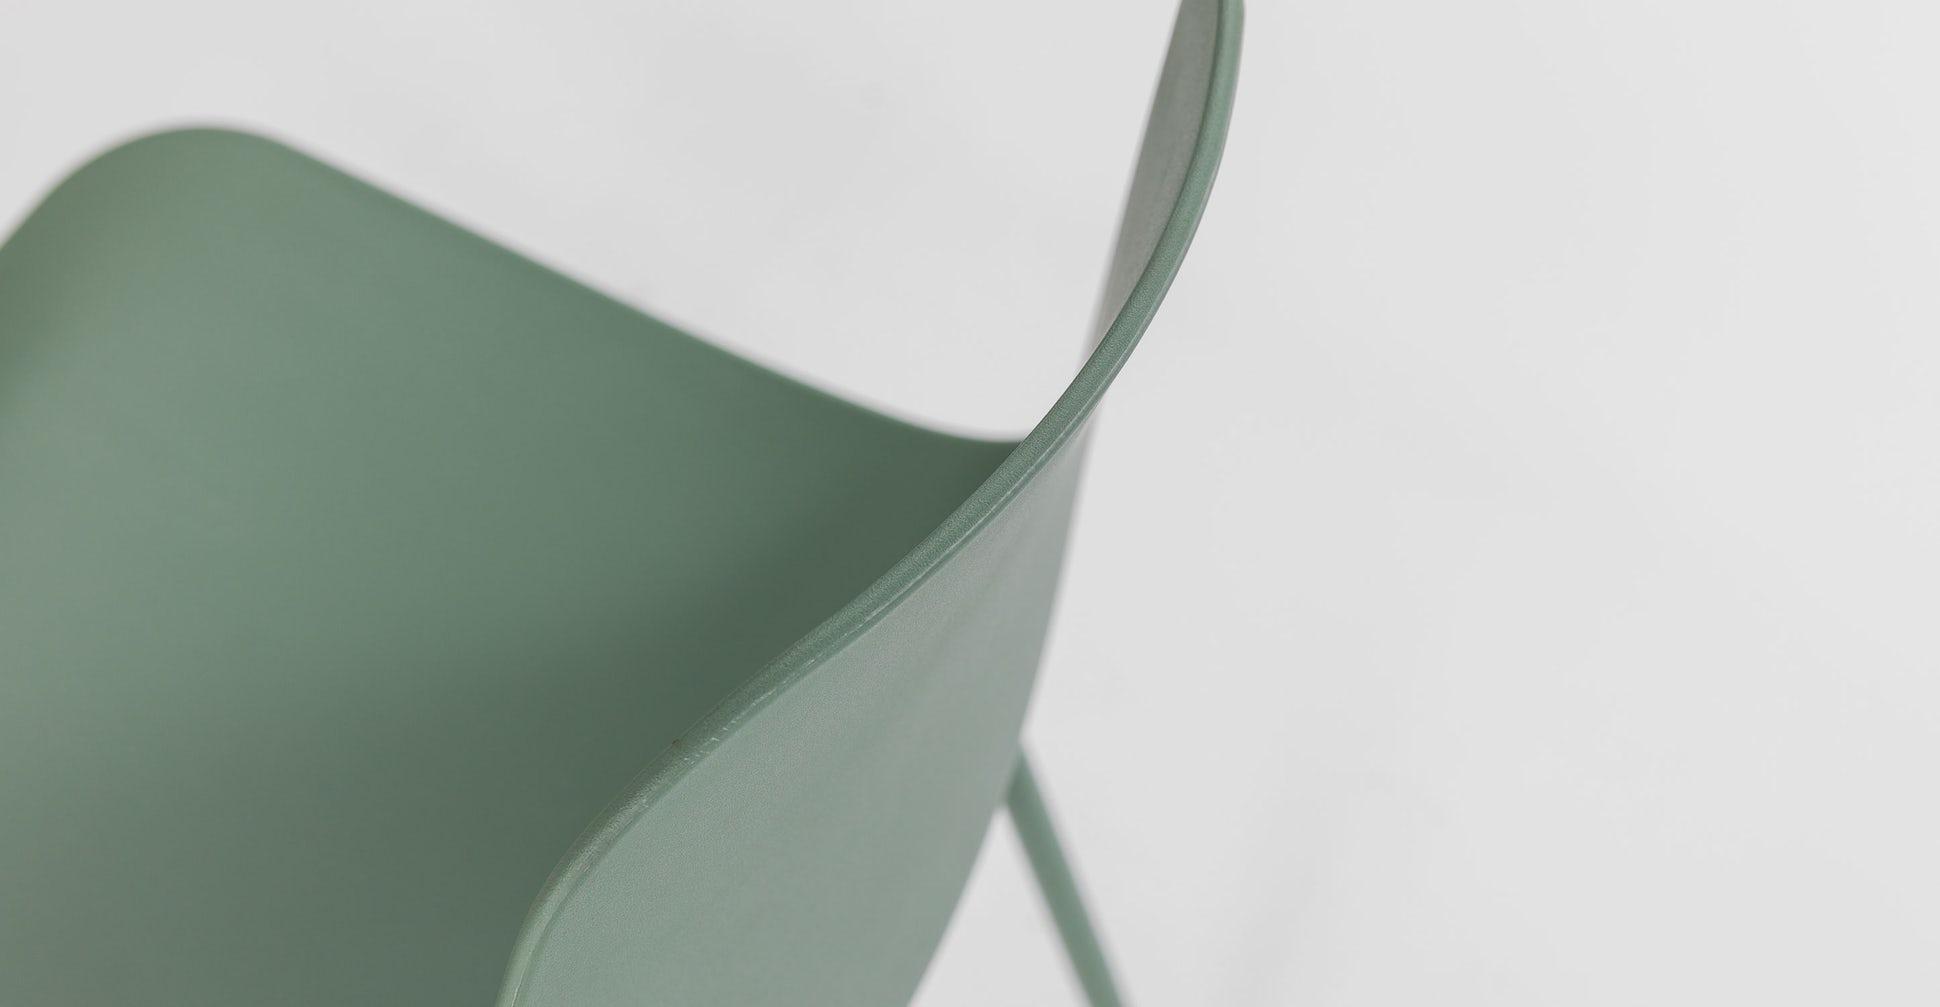 Svelti Aloe Green Dining Chair -Pair (set of 2)